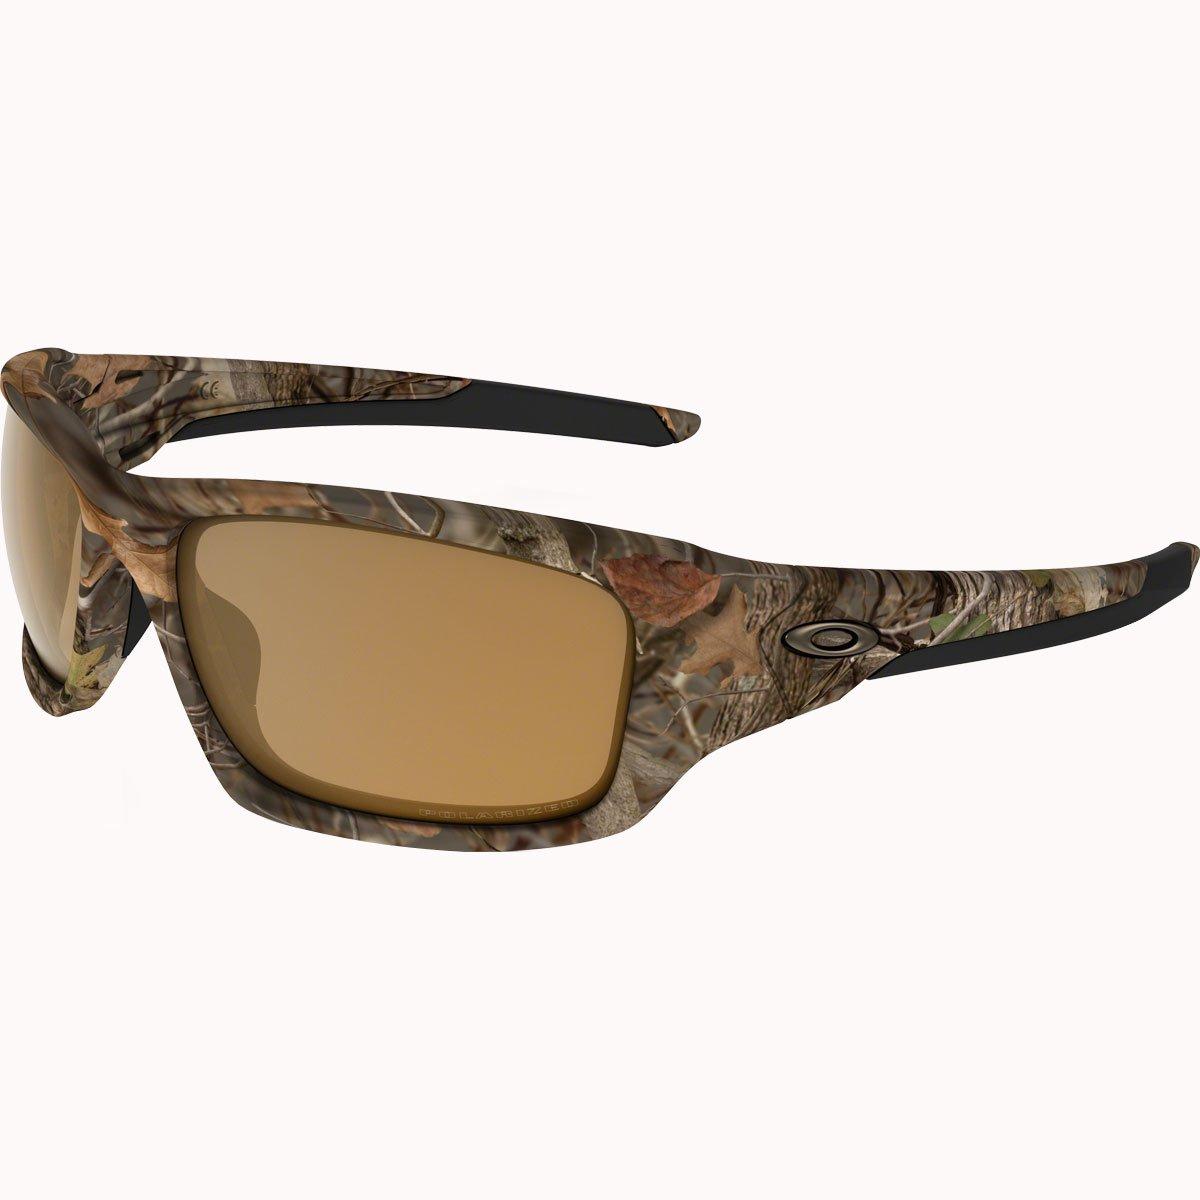 Oakley Men's Valve OO9236-25 Polarized Rectangular Sunglasses, Woodland Camouflage, 60 mm by Oakley